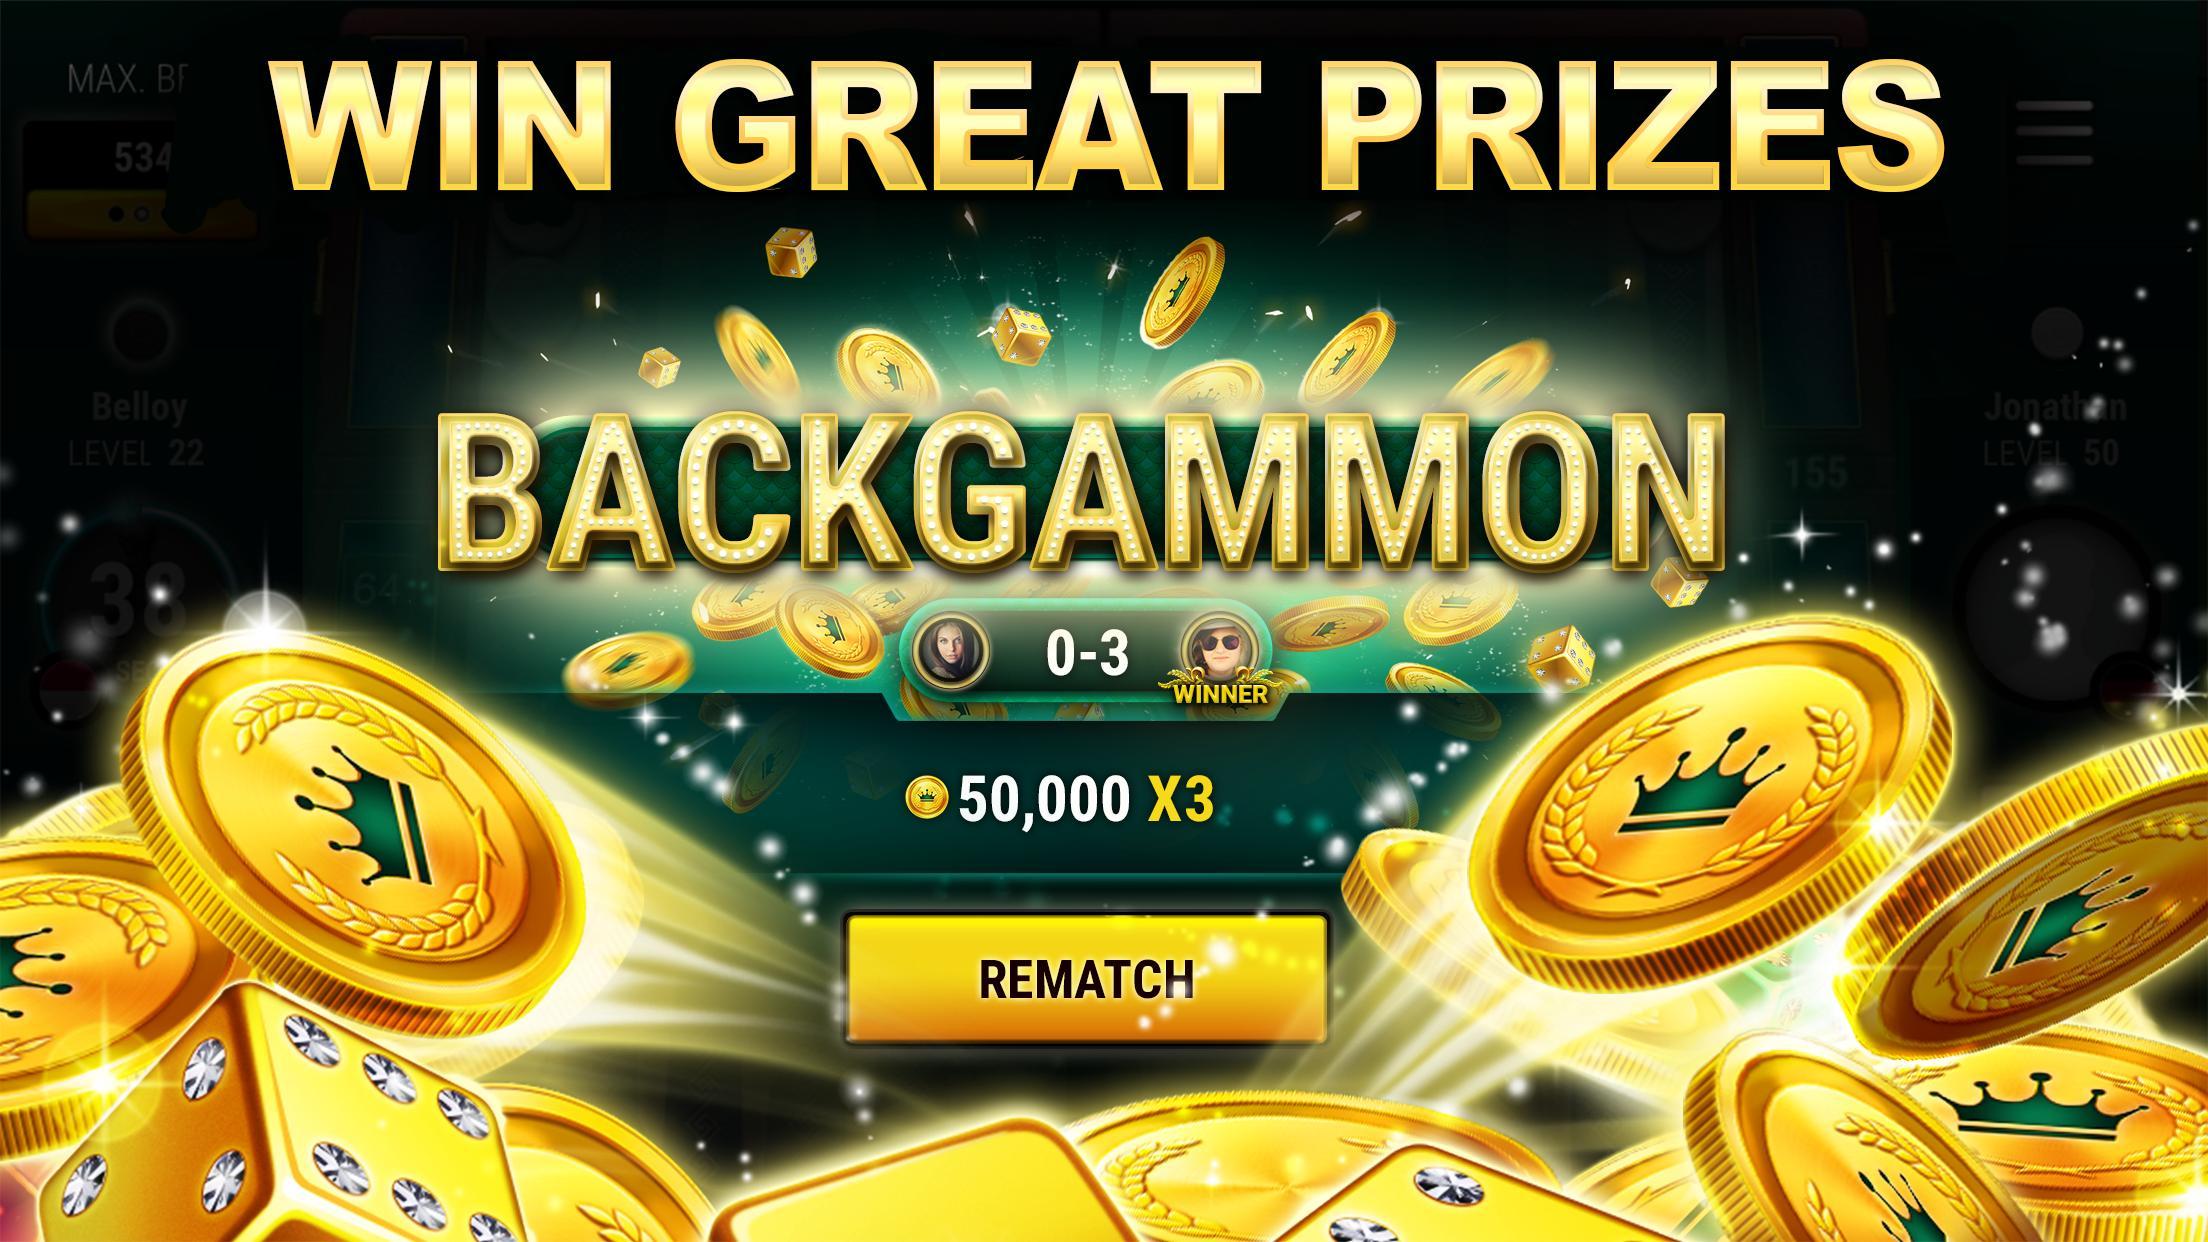 Backgammon Live - Play Online Free Backgammon 3.5.245 Screenshot 3